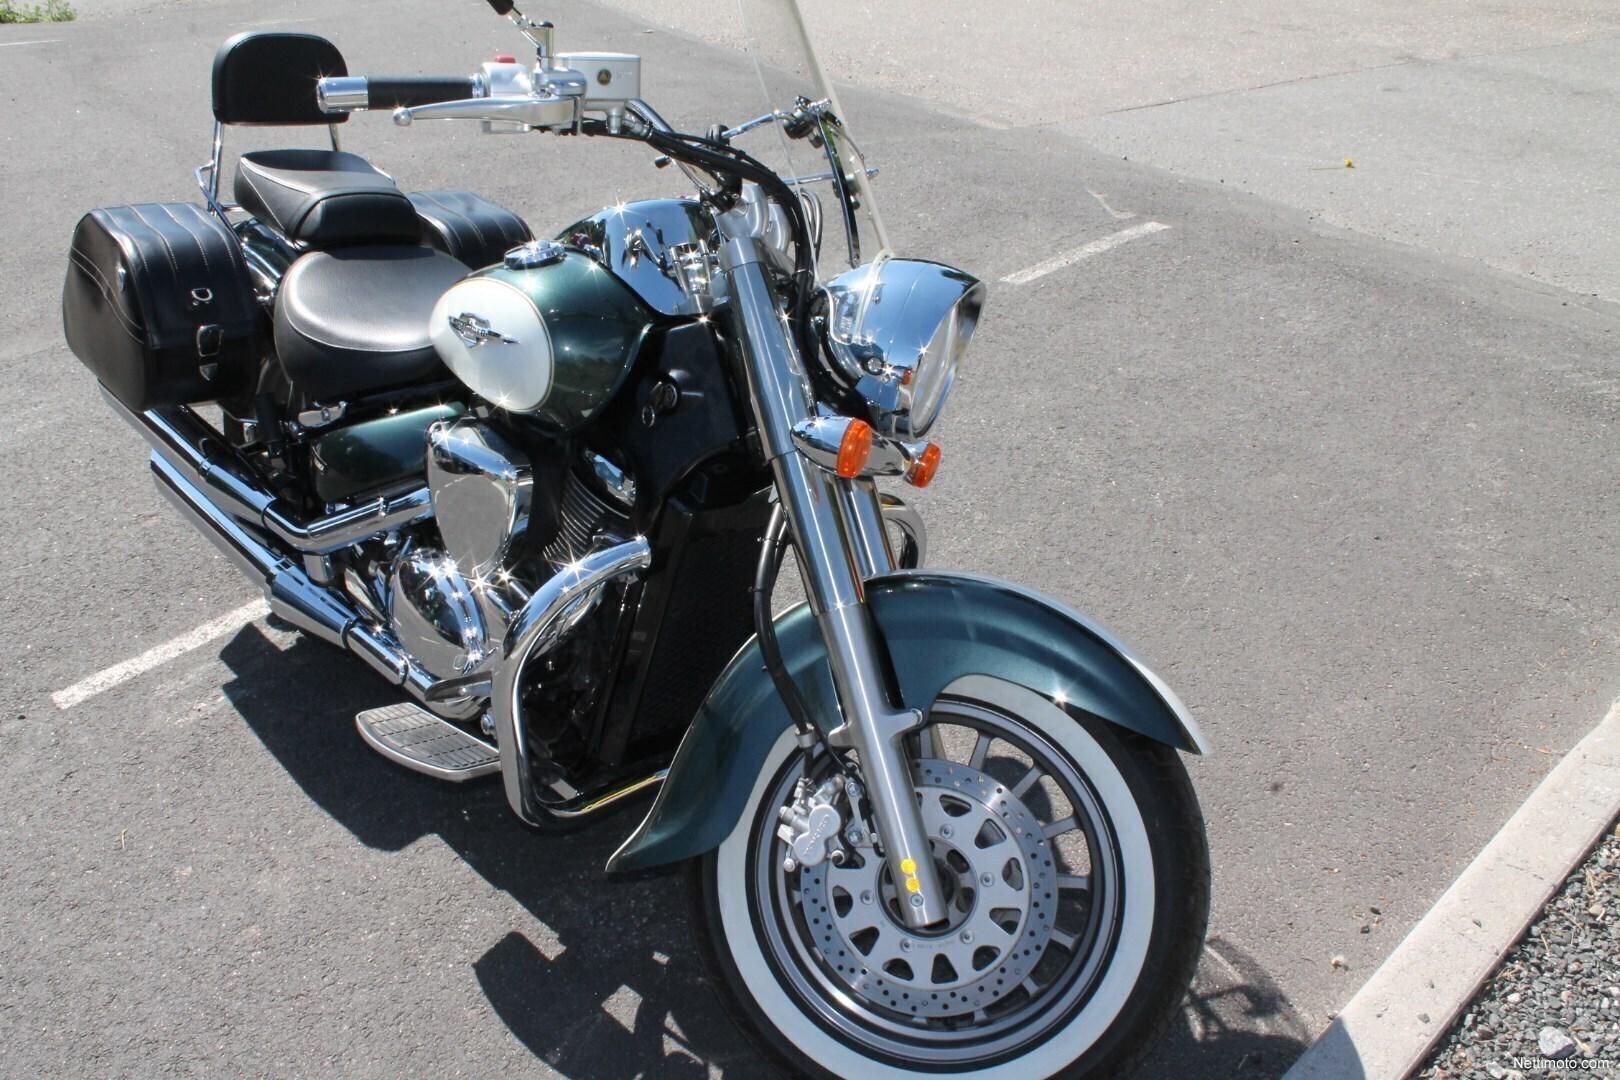 Suzuki VL VLR 1800 T. 1 800 cm³ 2011 - Pirkkala